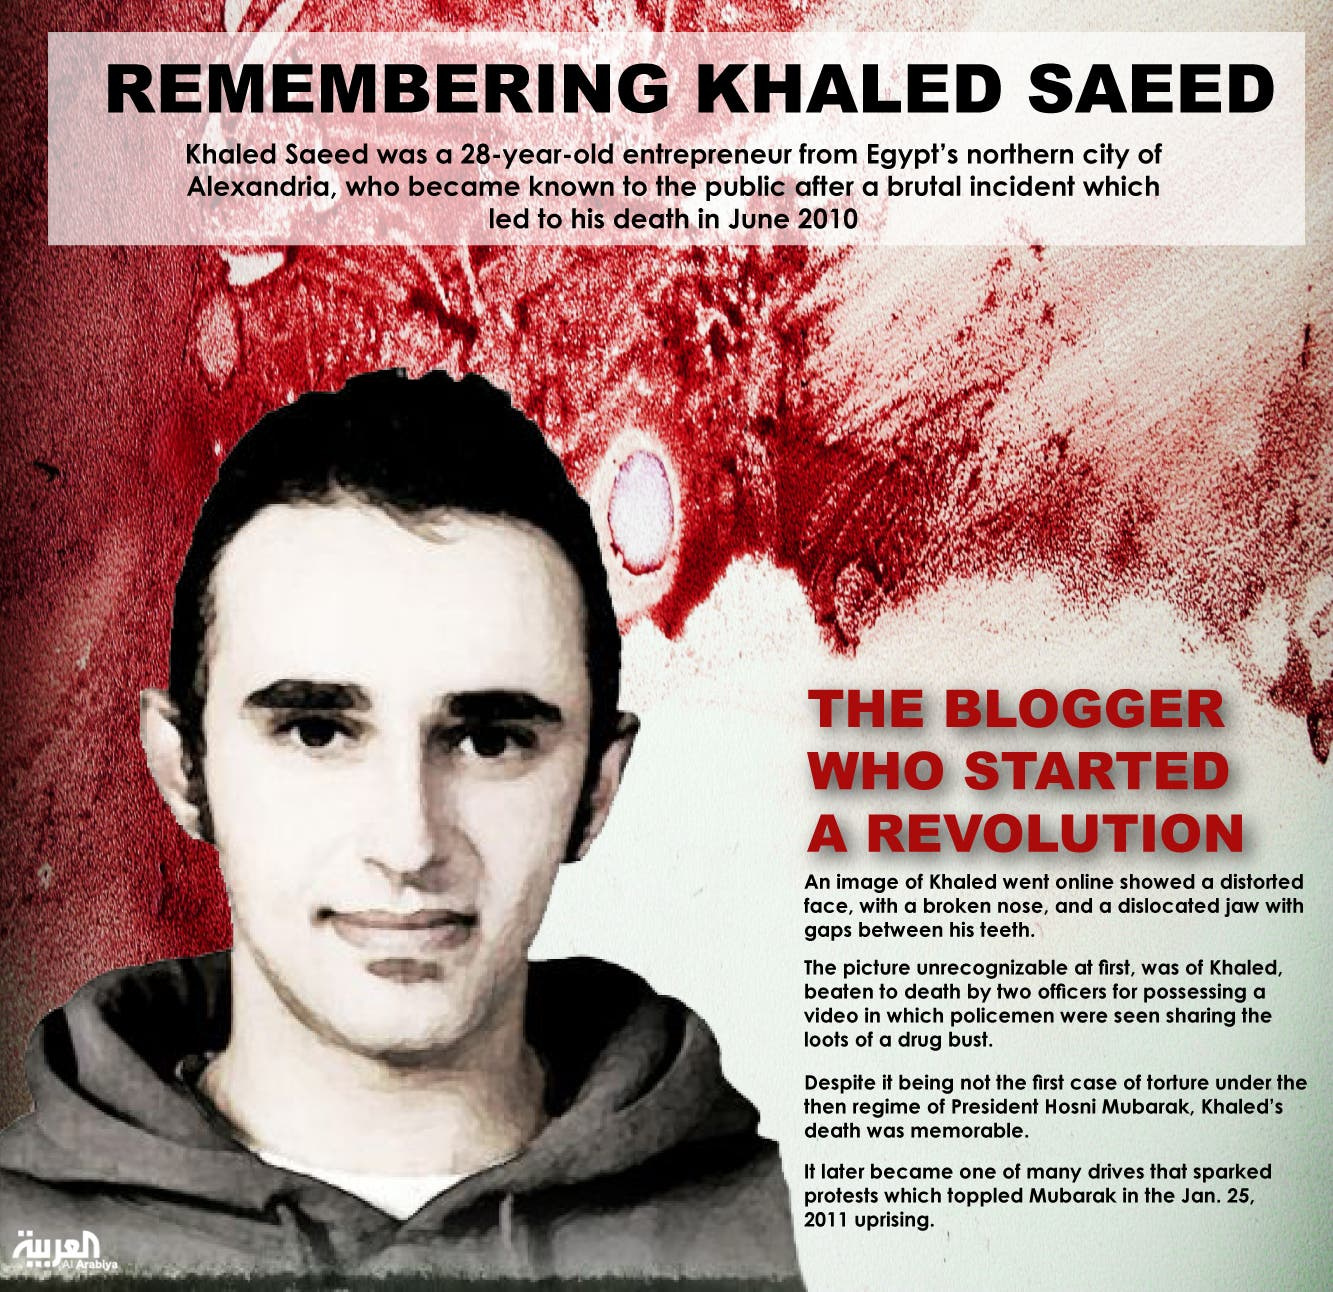 Infographic: Remembering Khaled Saeed